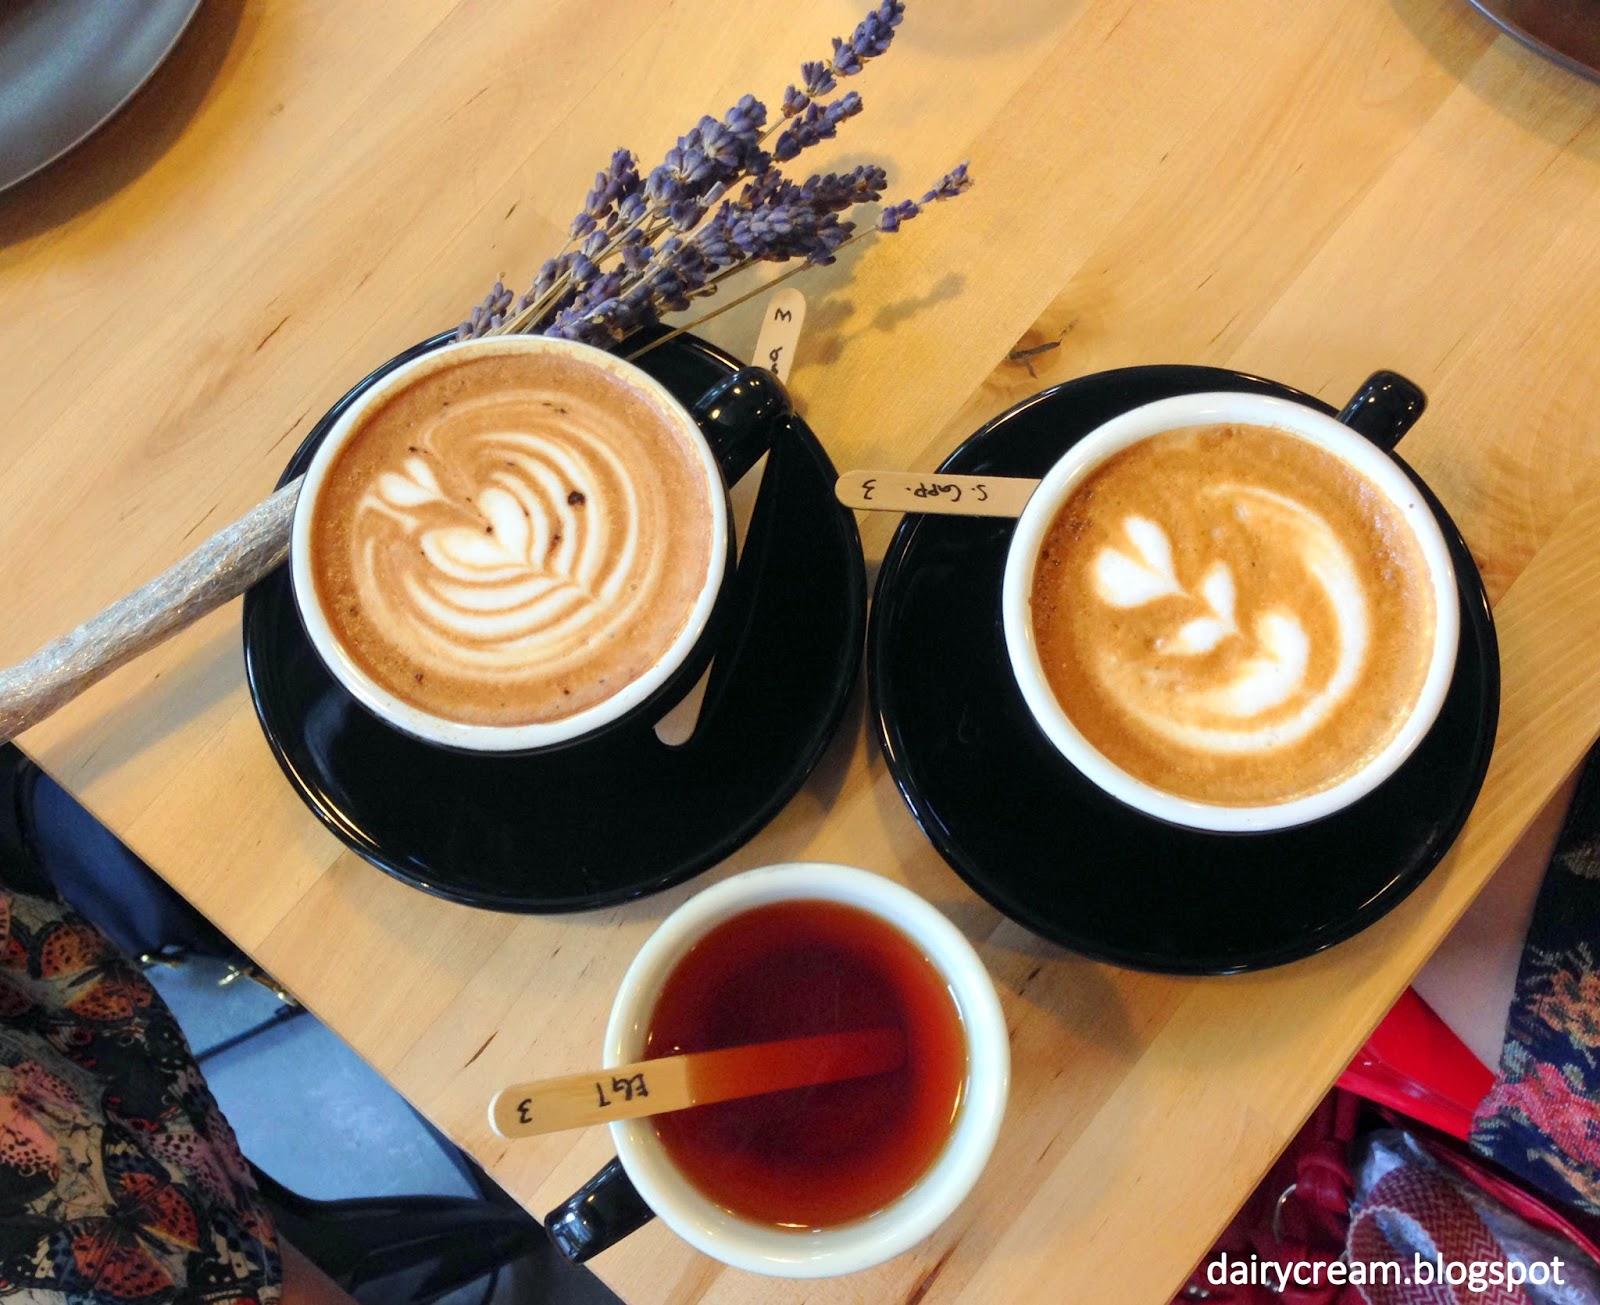 Coffee Cafe Tart Cedric Grolet